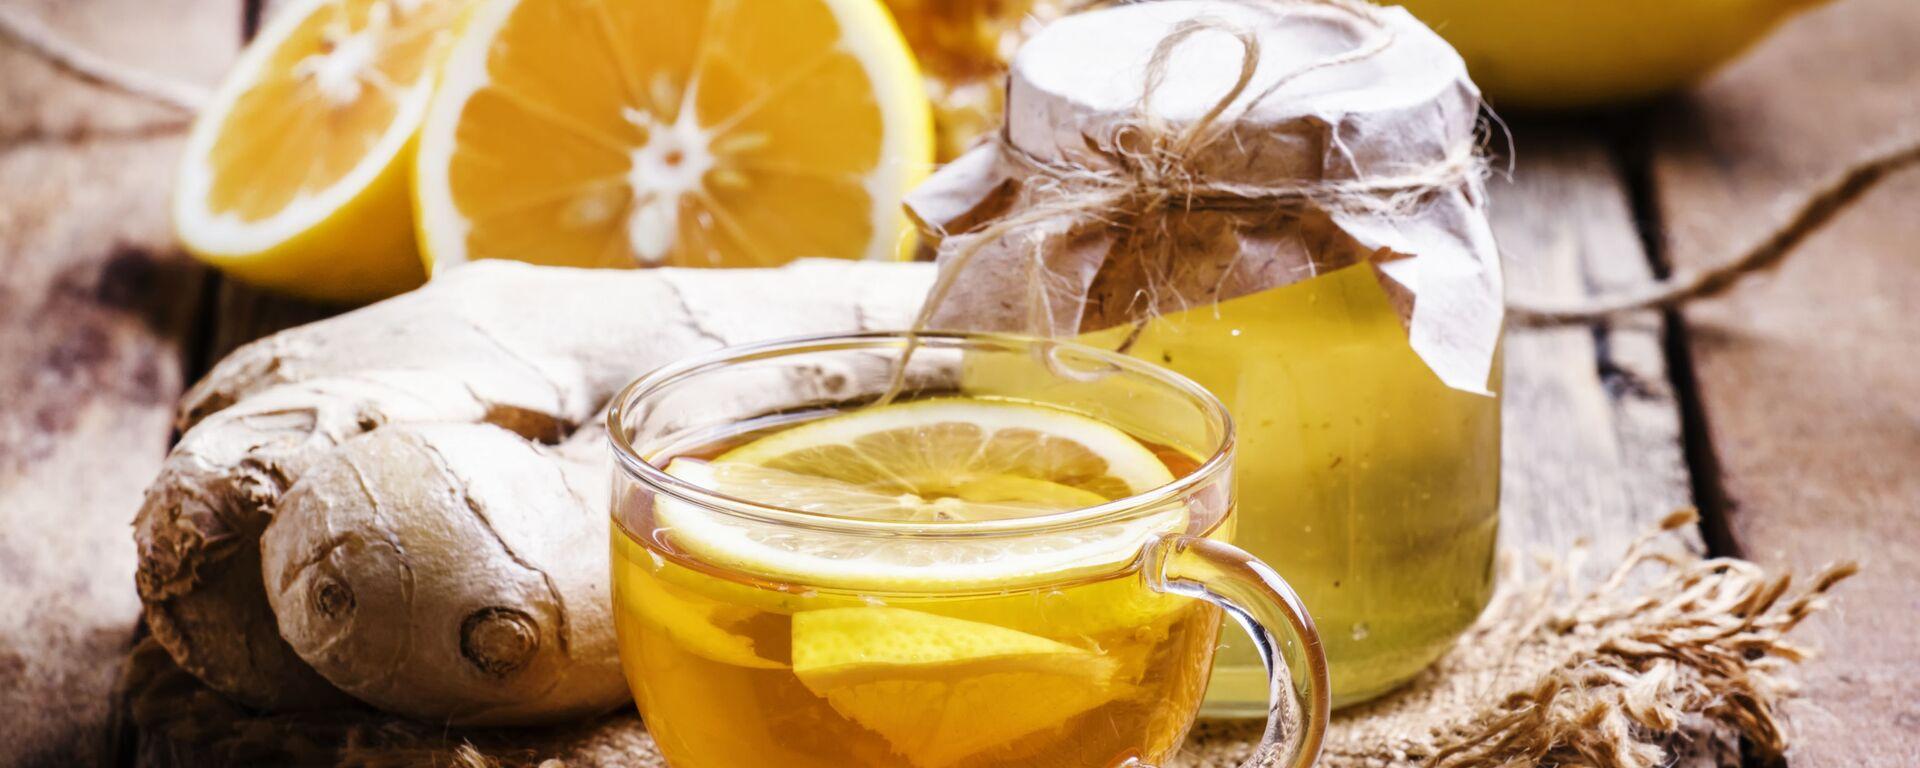 Tè con miele e limone - Sputnik Italia, 1920, 21.05.2021